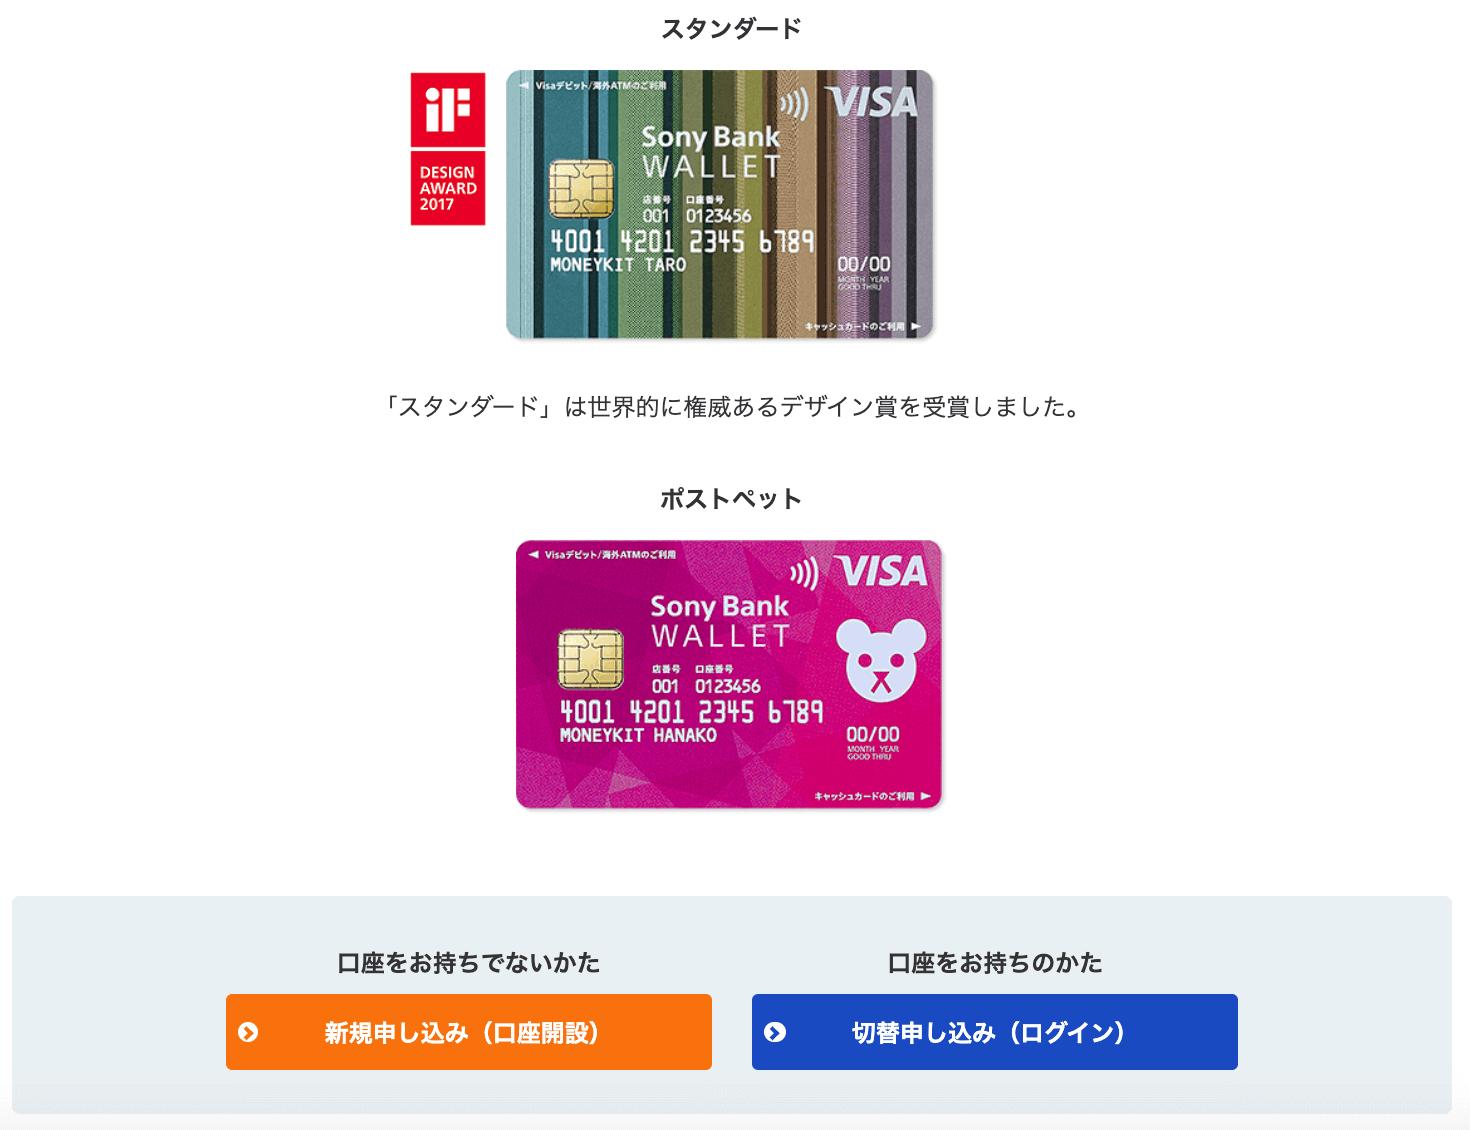 Sony Bank WALLET のお申し込み画面(2019年9月版)